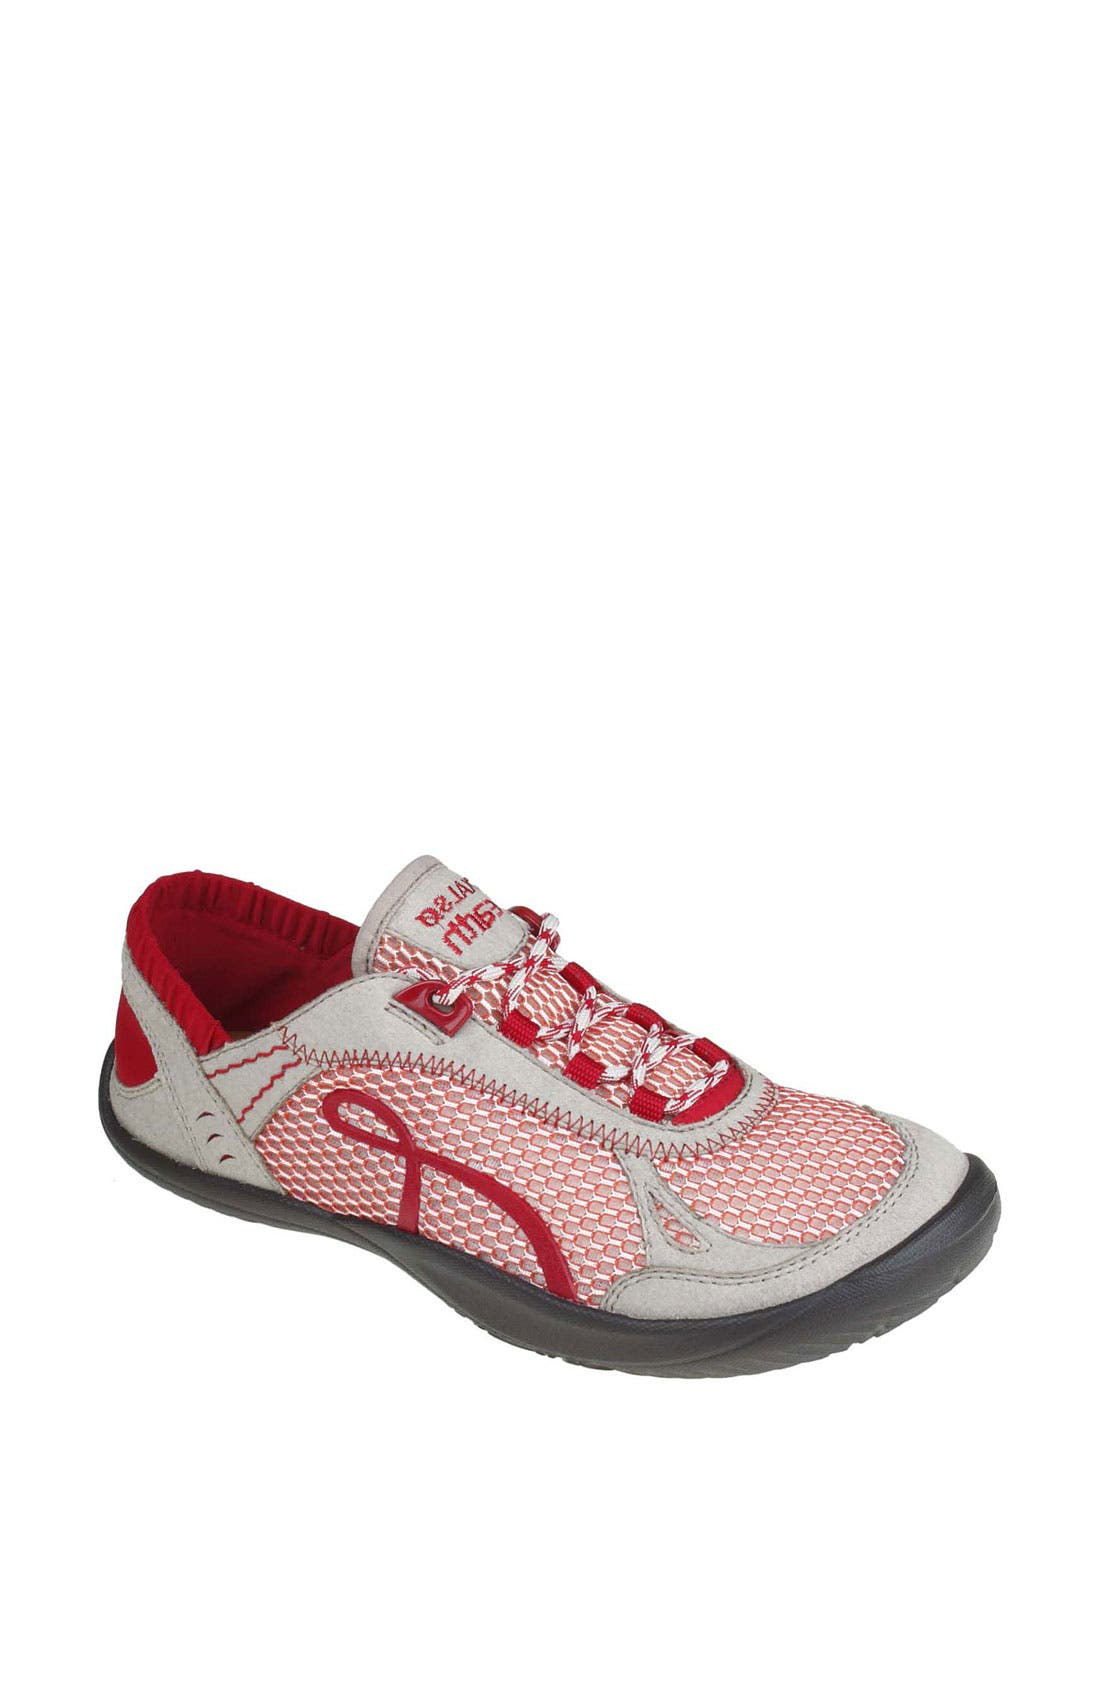 Main Image - Kalso Earth® 'Prosper' Sneaker